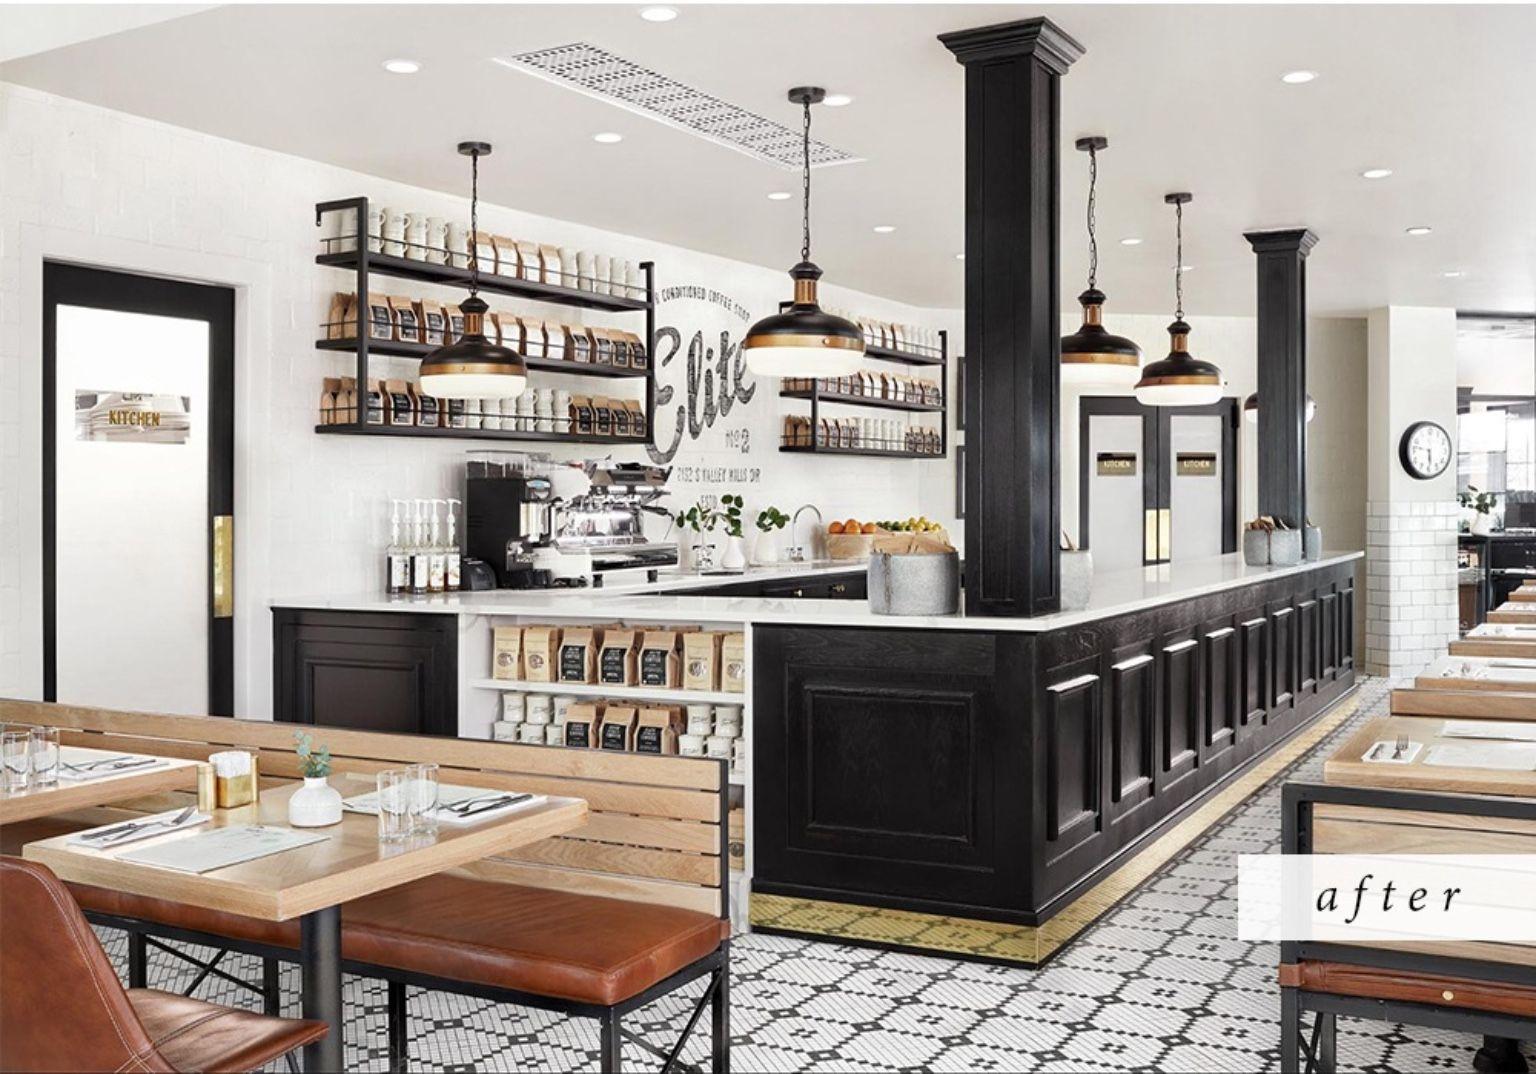 Booth Design Restaurant Decor Counter Design Restaurant Design